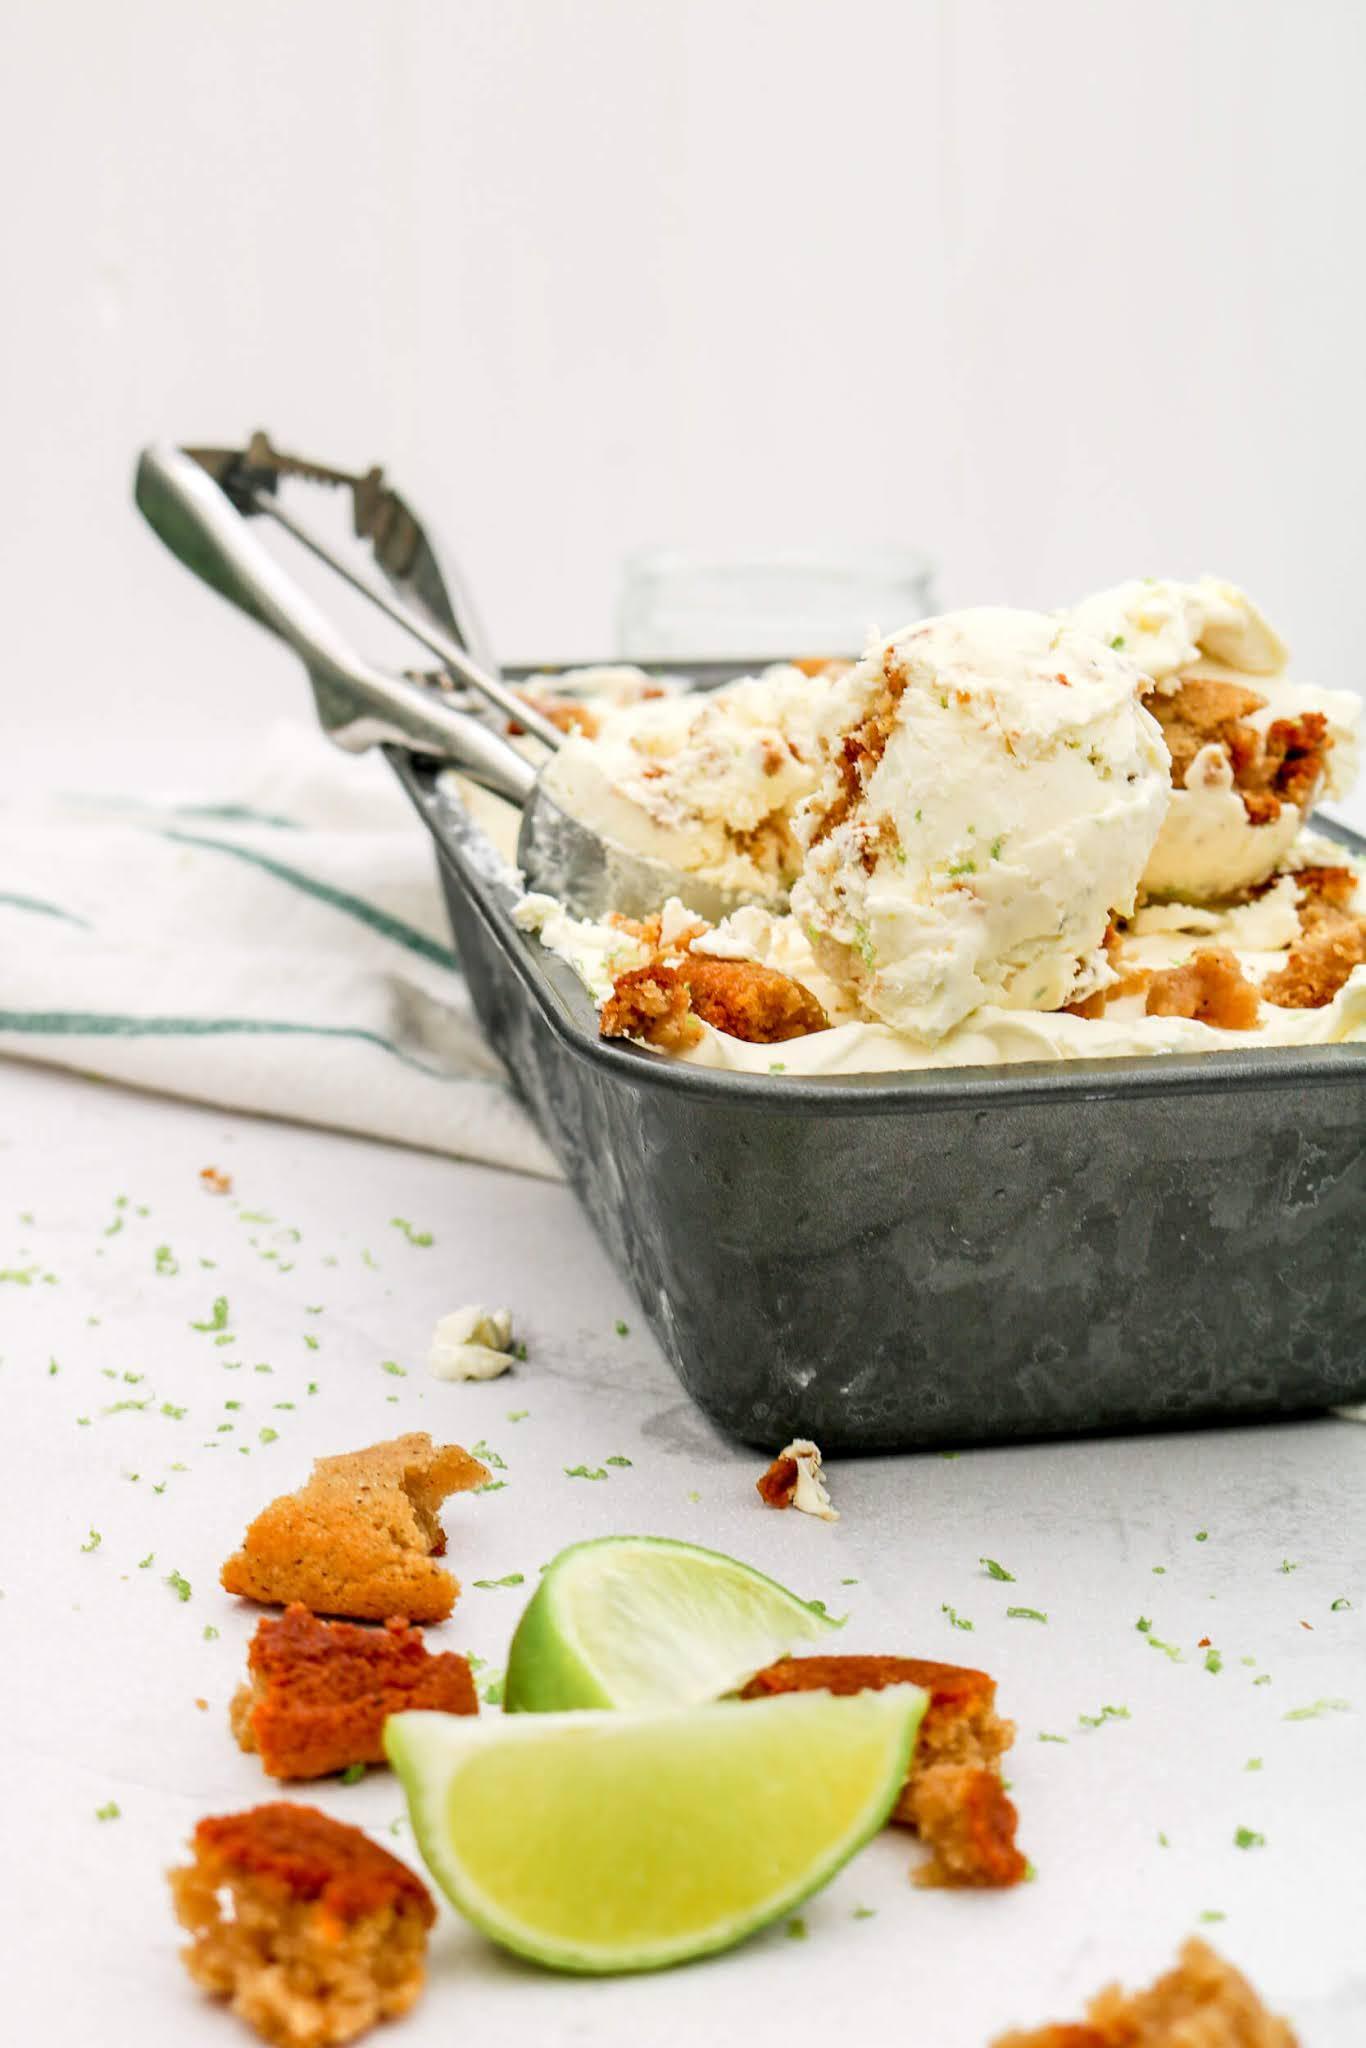 No Churn Lime Pie Cheesecake Ice Cream | Take Some Whisks